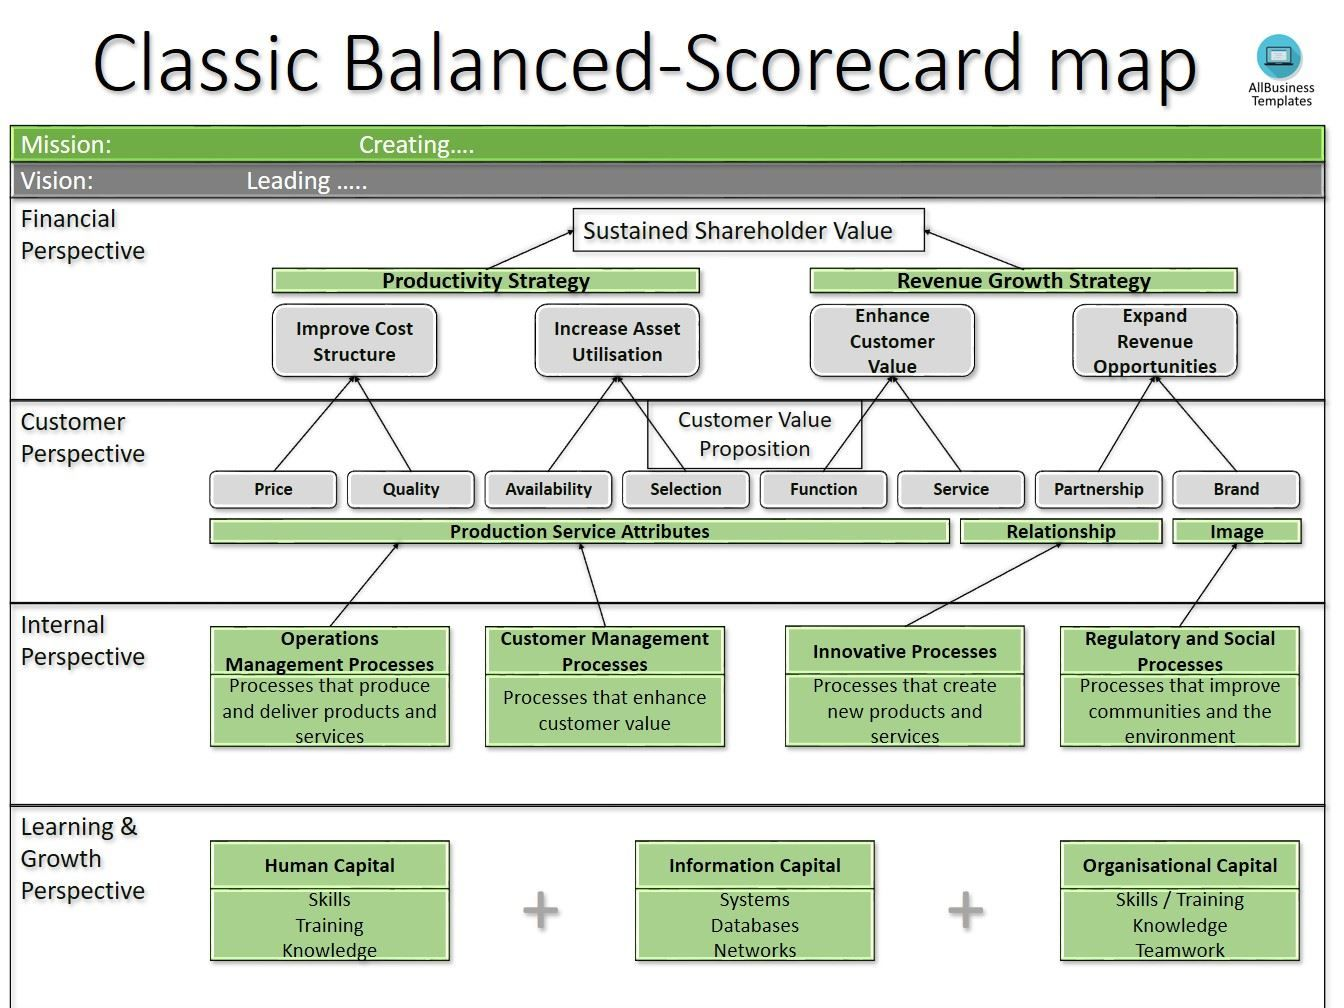 Business Balanced Scorecard Template Templates At Allbusinesstemplates Com Strategy Map Strategic Planning Change Management